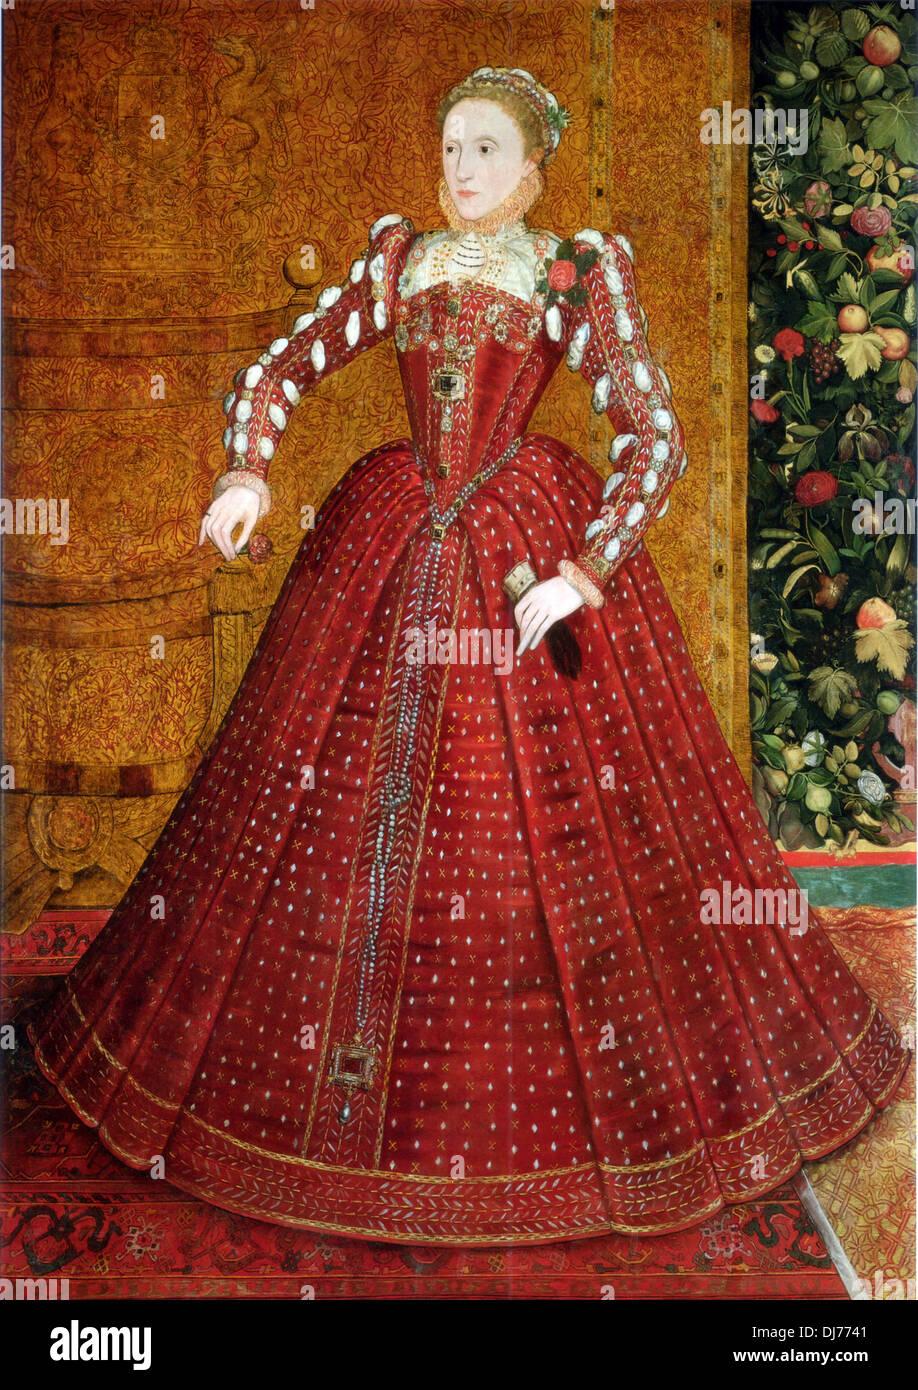 Queen Elizabeth I of England - Stock Image